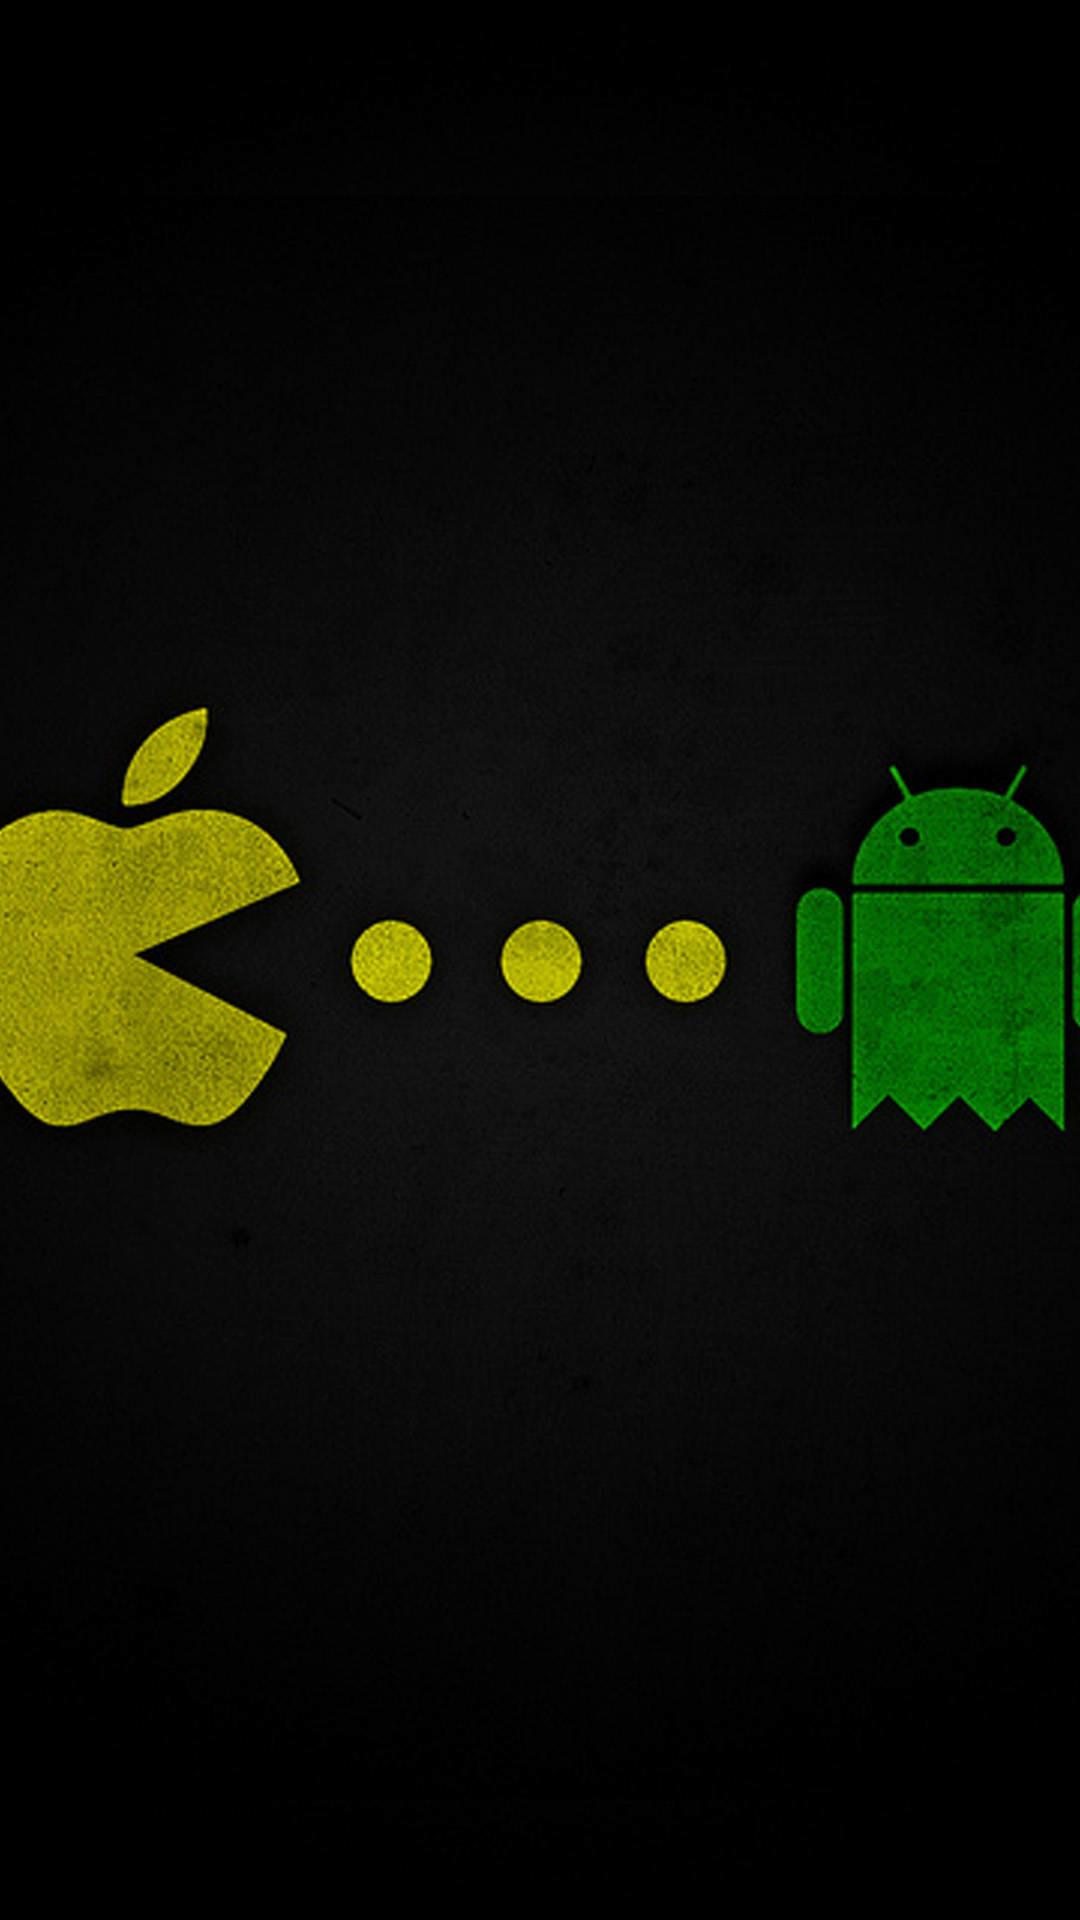 Apk 3d Wallpaper Android Apple Wallpaper 71 Images